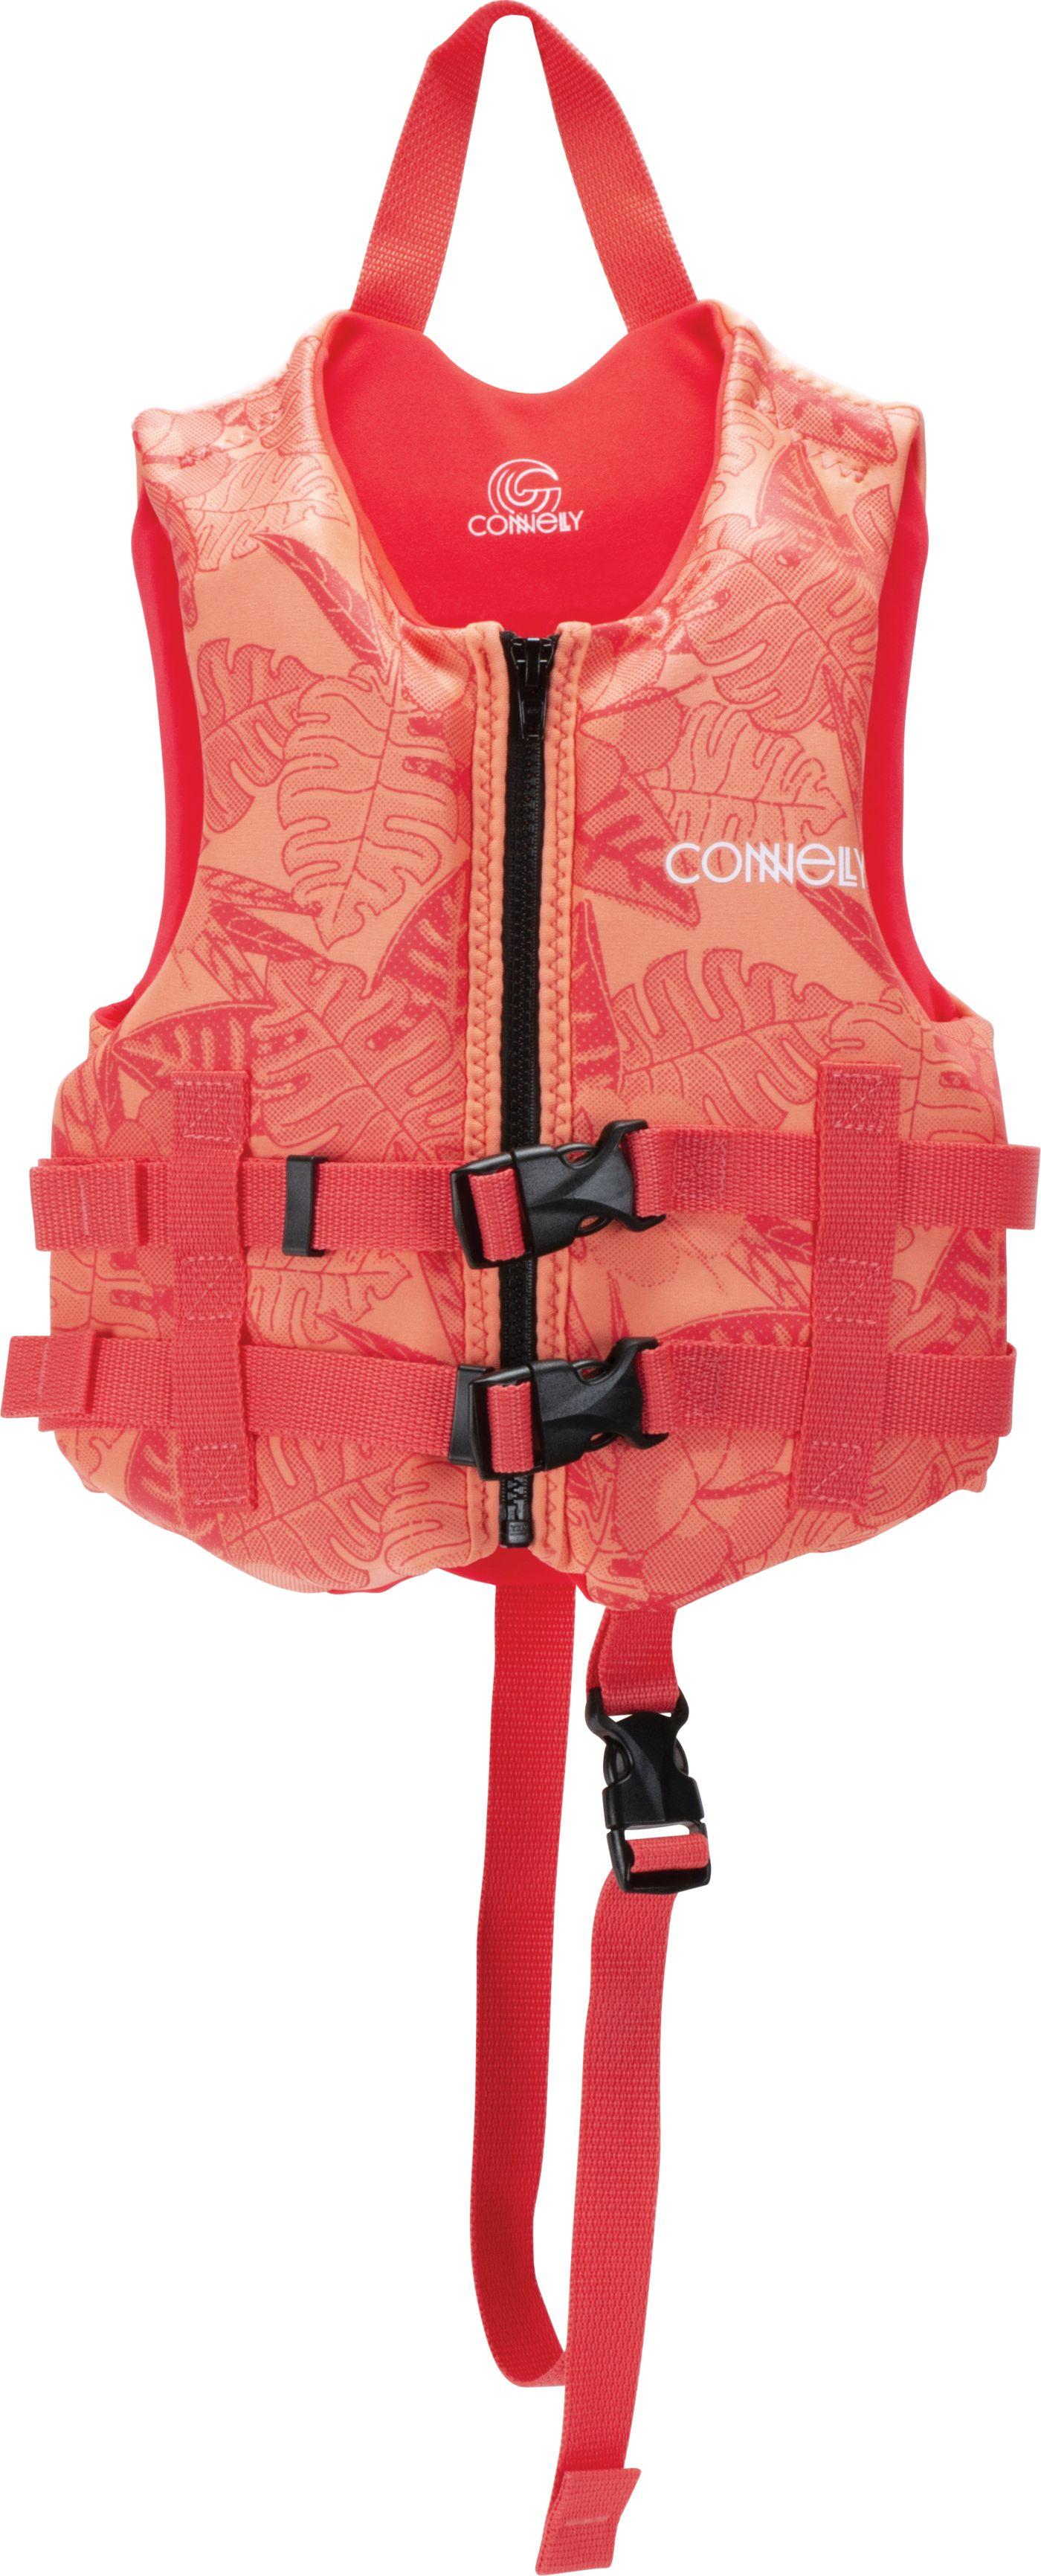 Connelly Child Promo Neo Life Vest